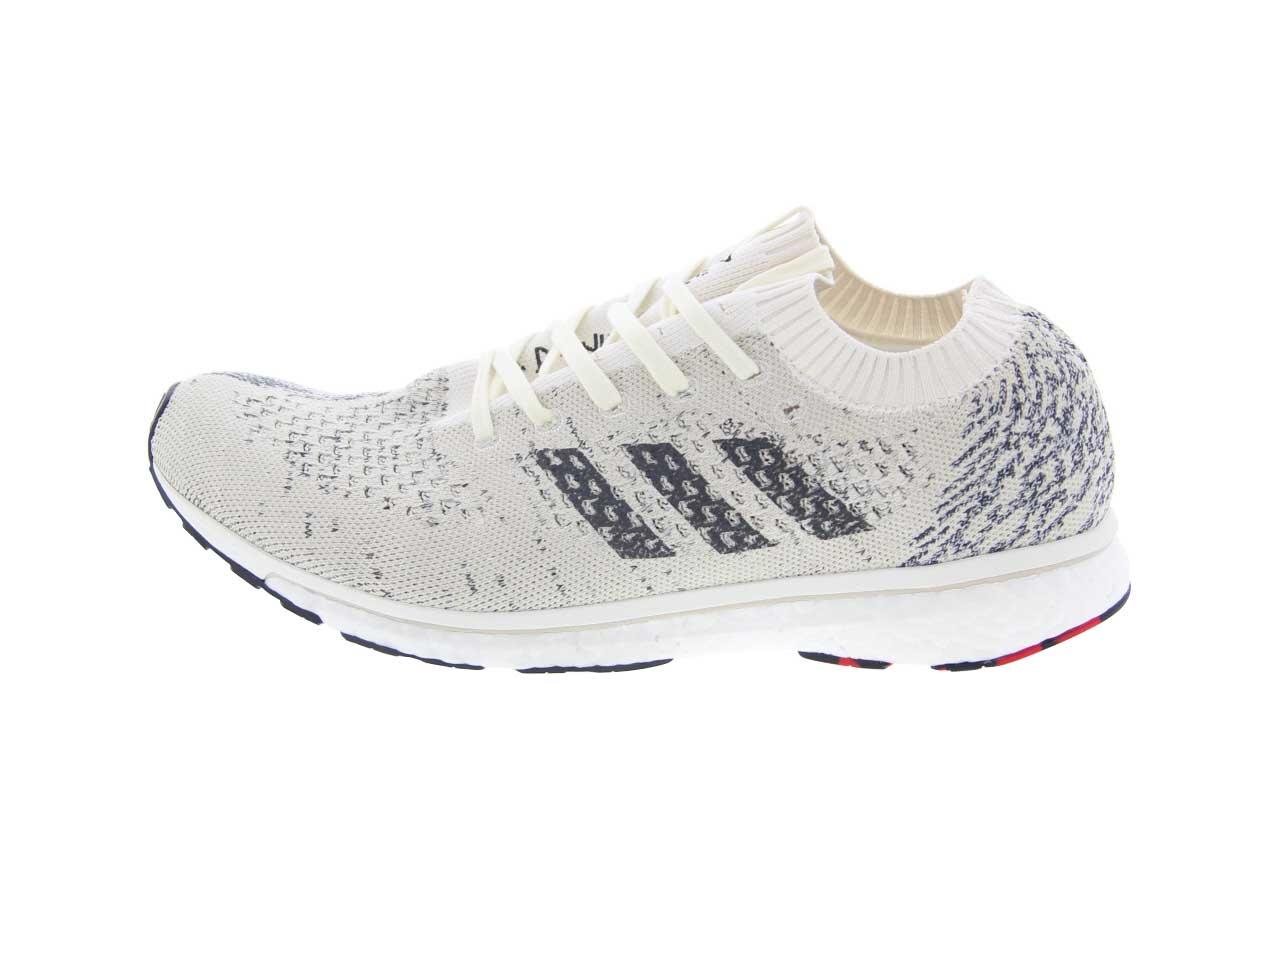 adidas adizero Prime LTD(BB6574)【アディダス アディゼロ プライムリミテッド】【メンズファッション】【シューズ】【スニーカー】【靴】【フットウェア】【ストアレビュー記載でソックスプレゼント対象品】